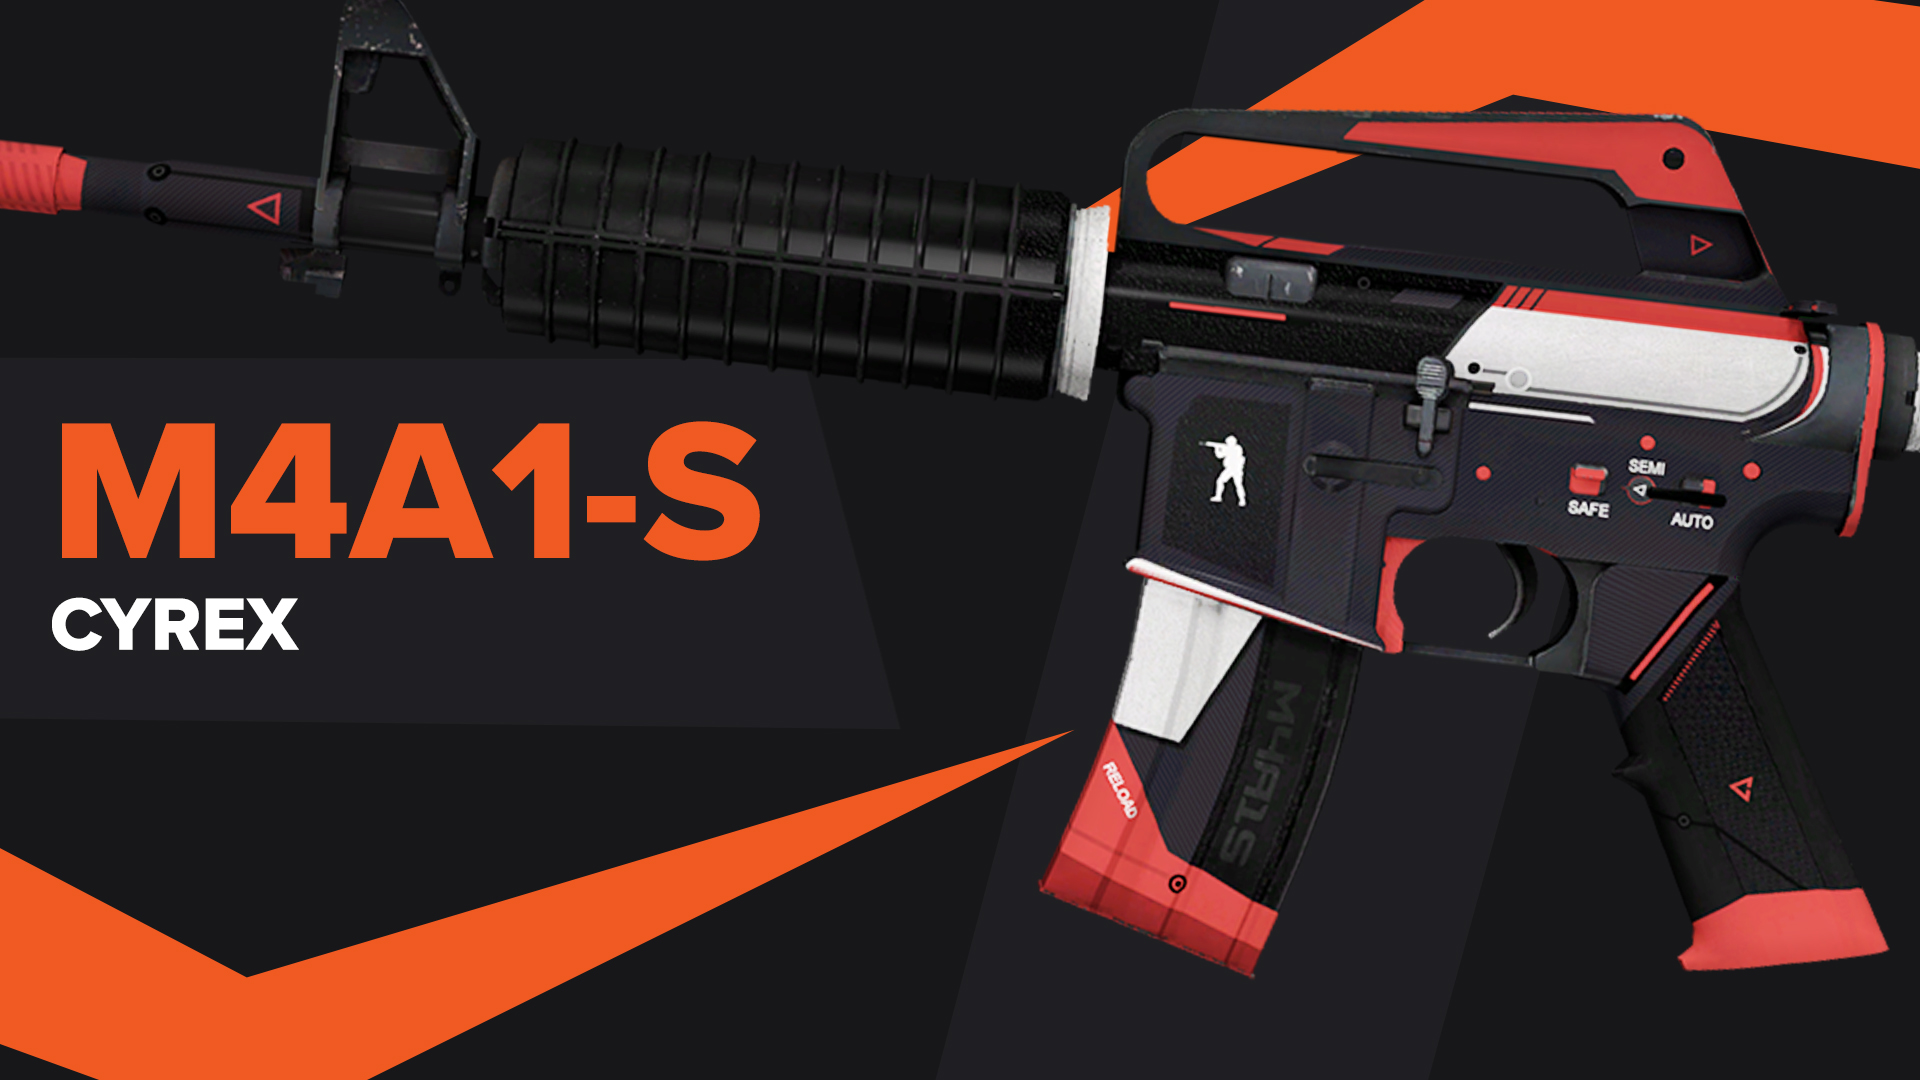 Cyrex CSGO Skin M4A1S